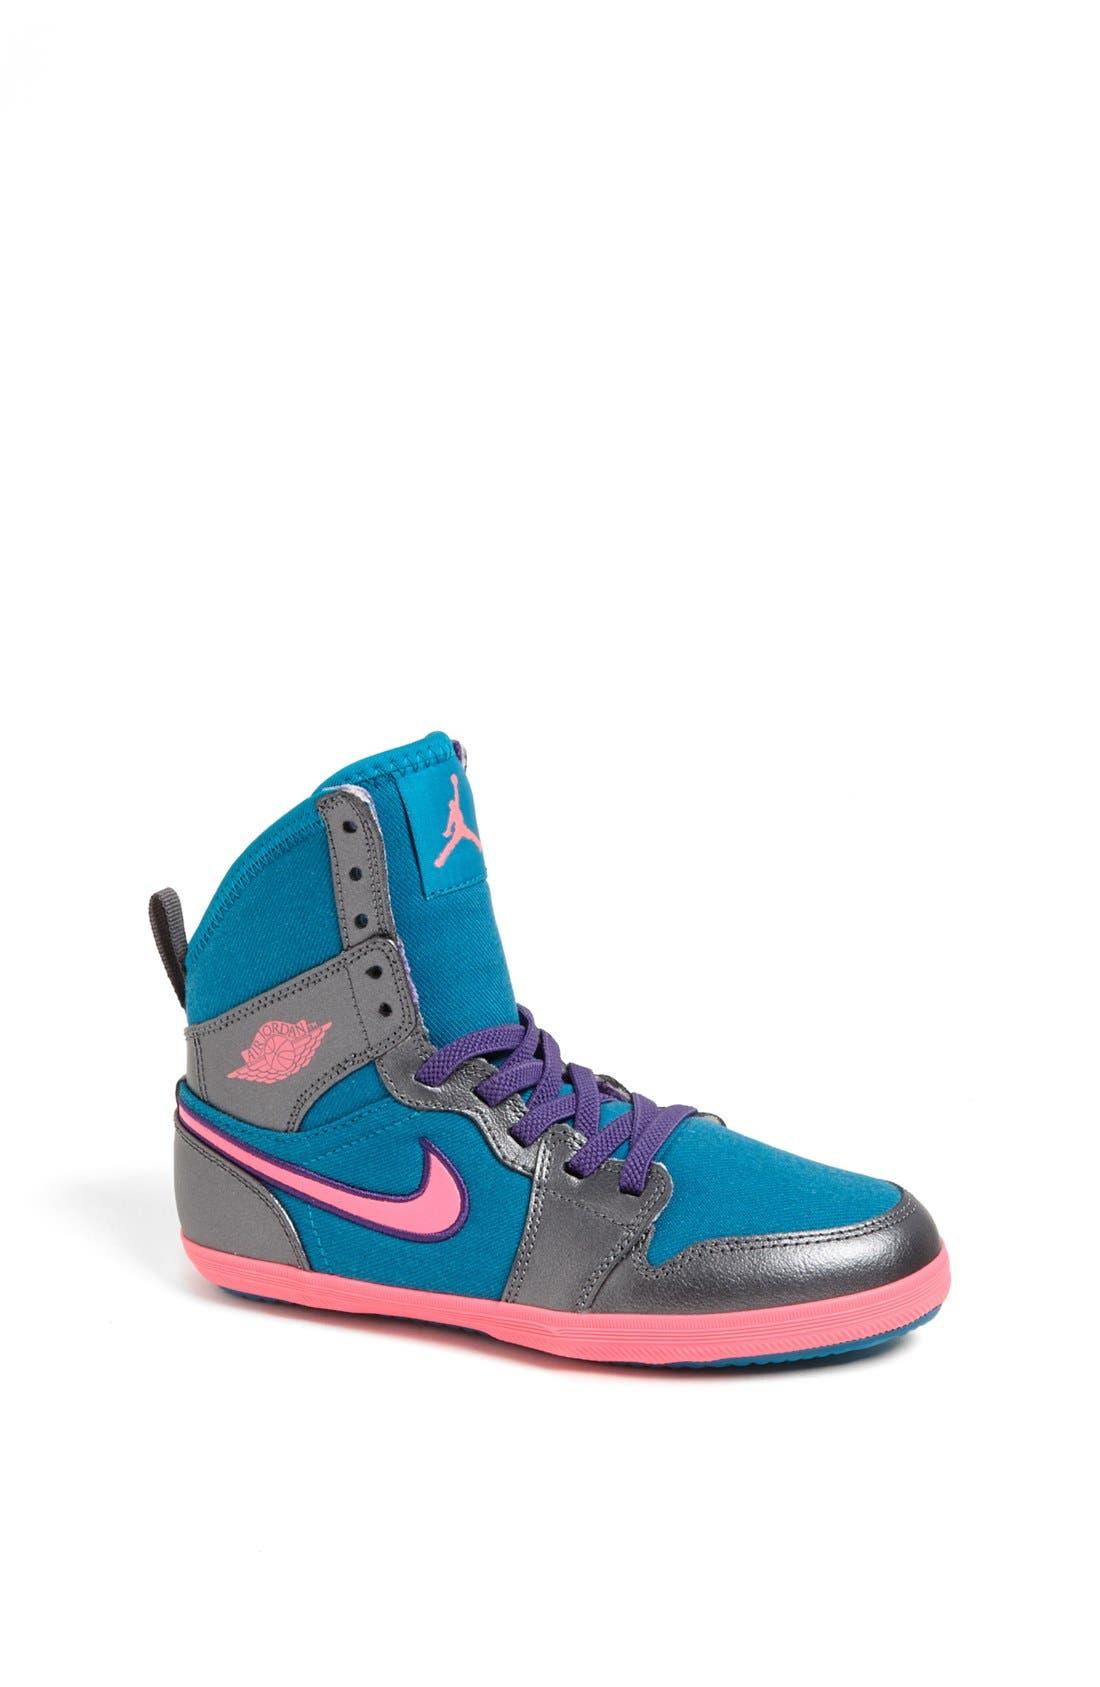 Main Image - Nike 'Jordan 1 Skinny High' Sneaker (Toddler & Little Kid)